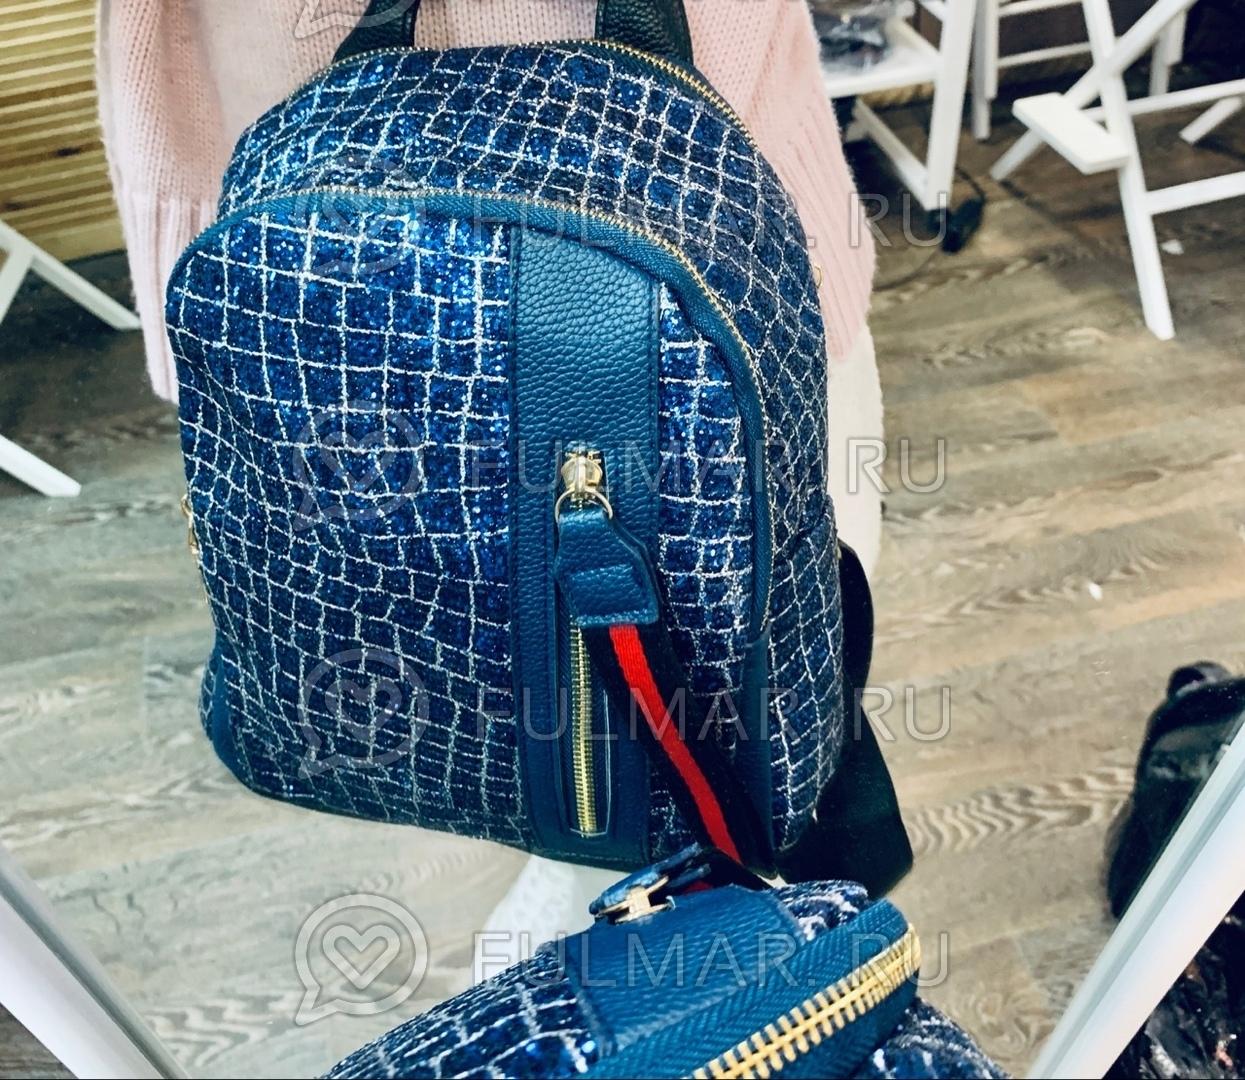 Рюкзак блестящий Голубой фото